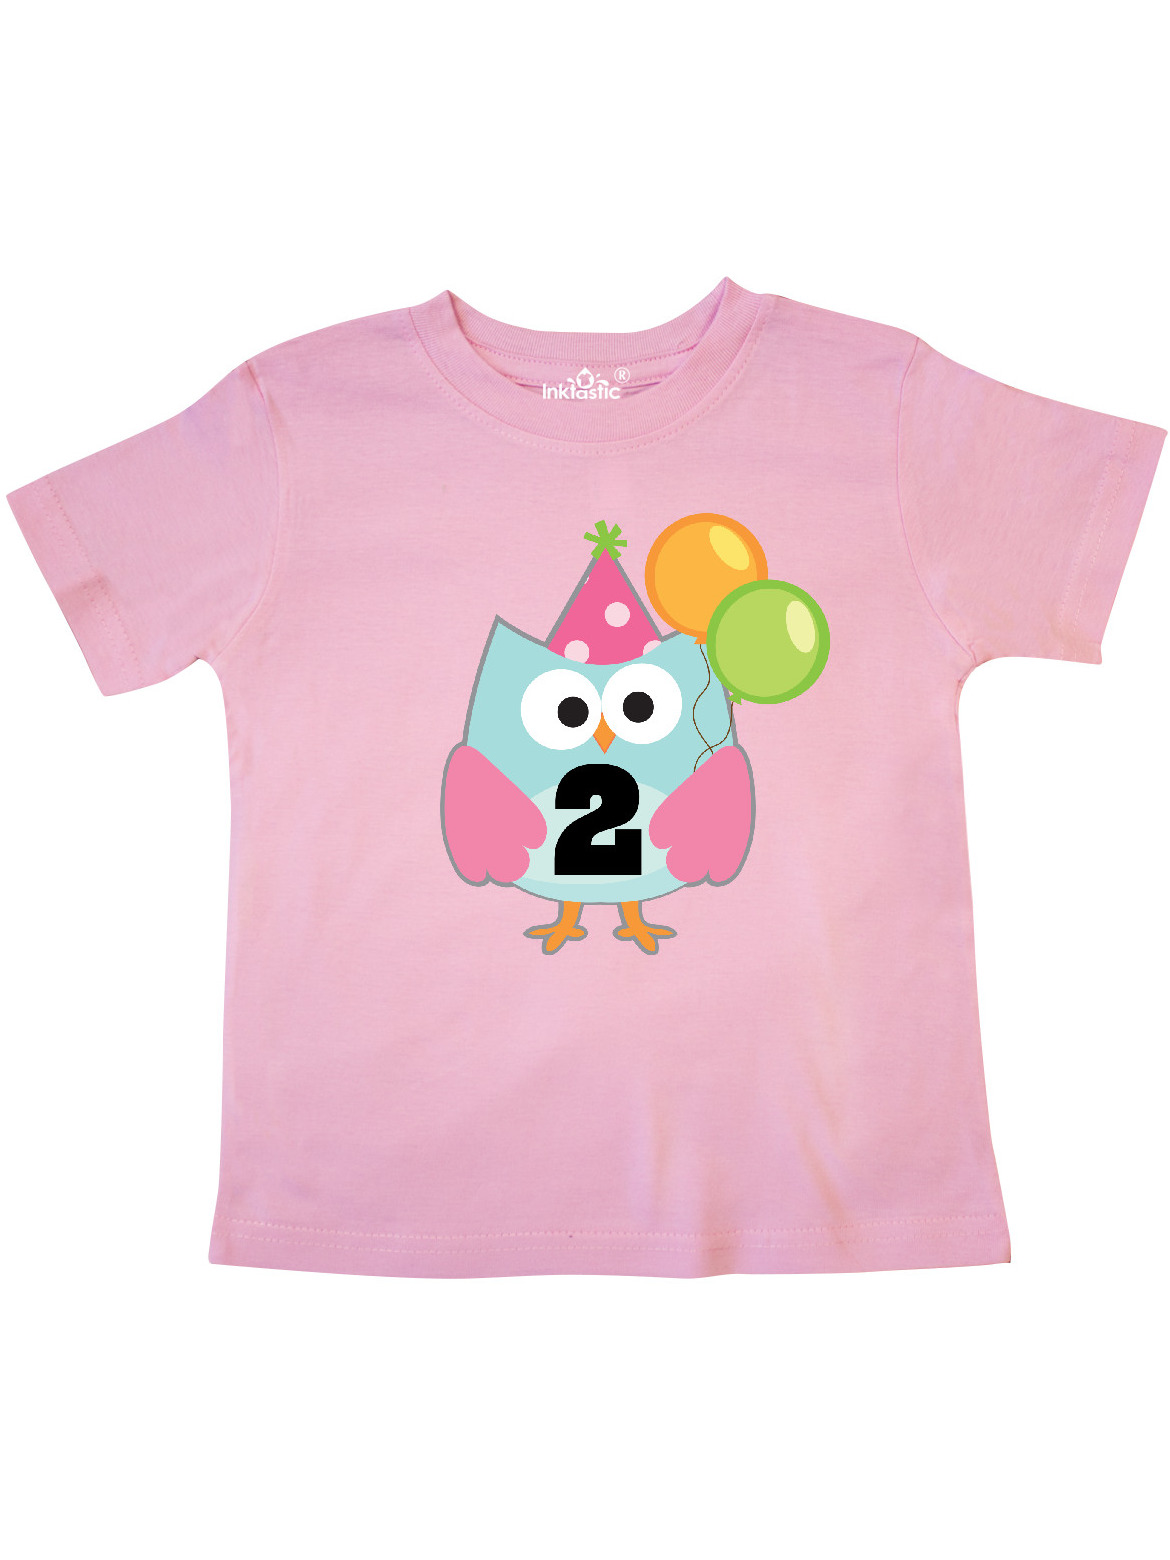 inktastic Owl Pink Polka Dot Toddler T-Shirt